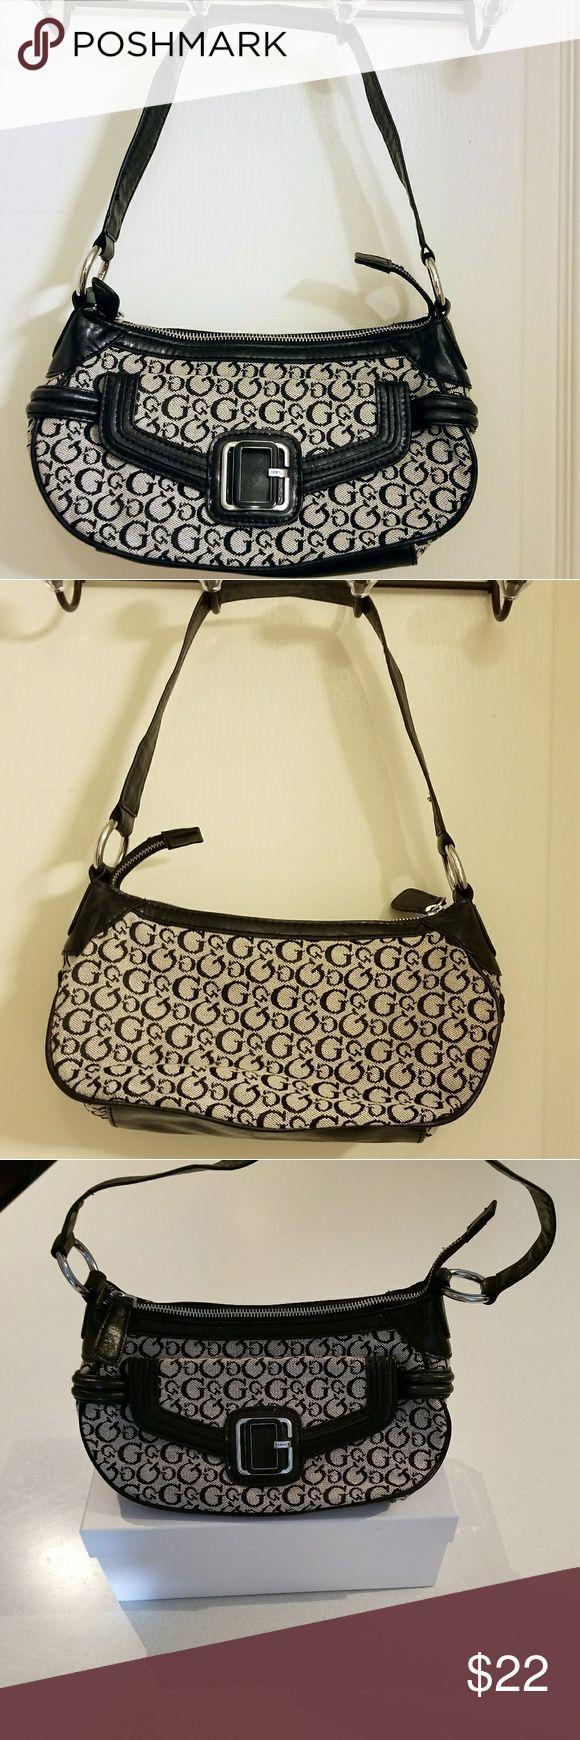 9a604a98fdd6d Guess Handbags In Pakistan